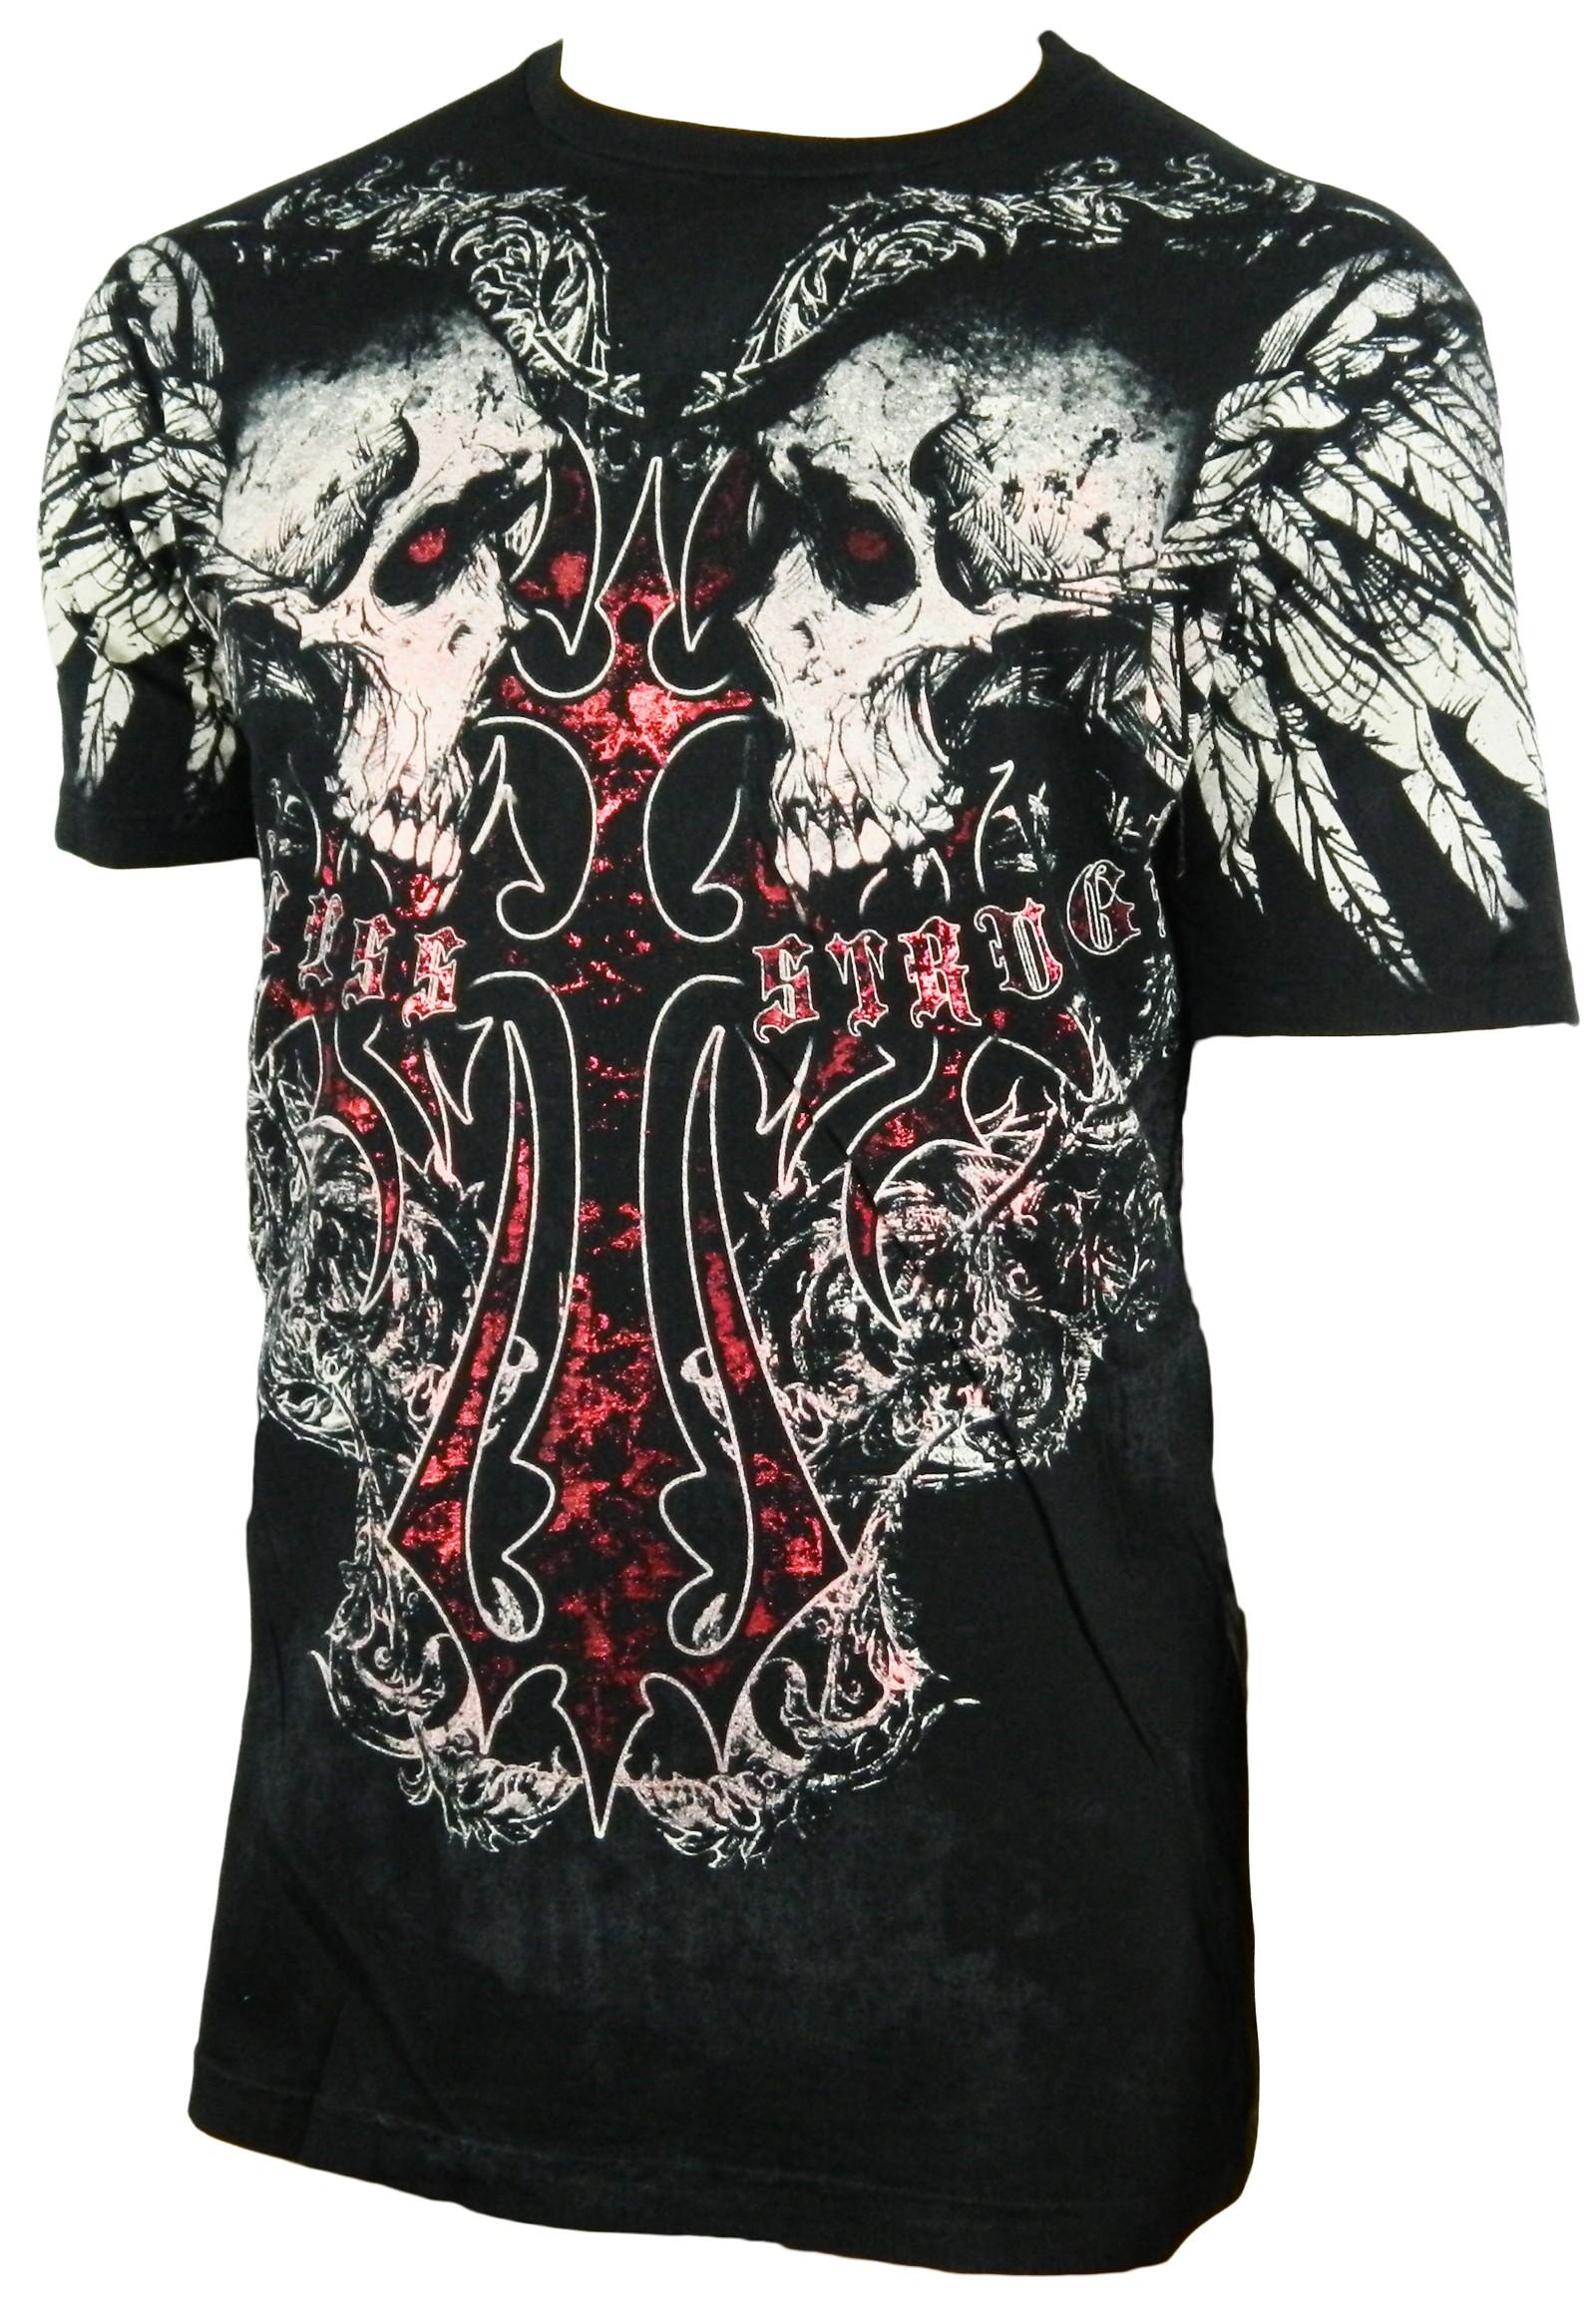 Xzavier - Cross my Bones Skulls T-Shirt Front